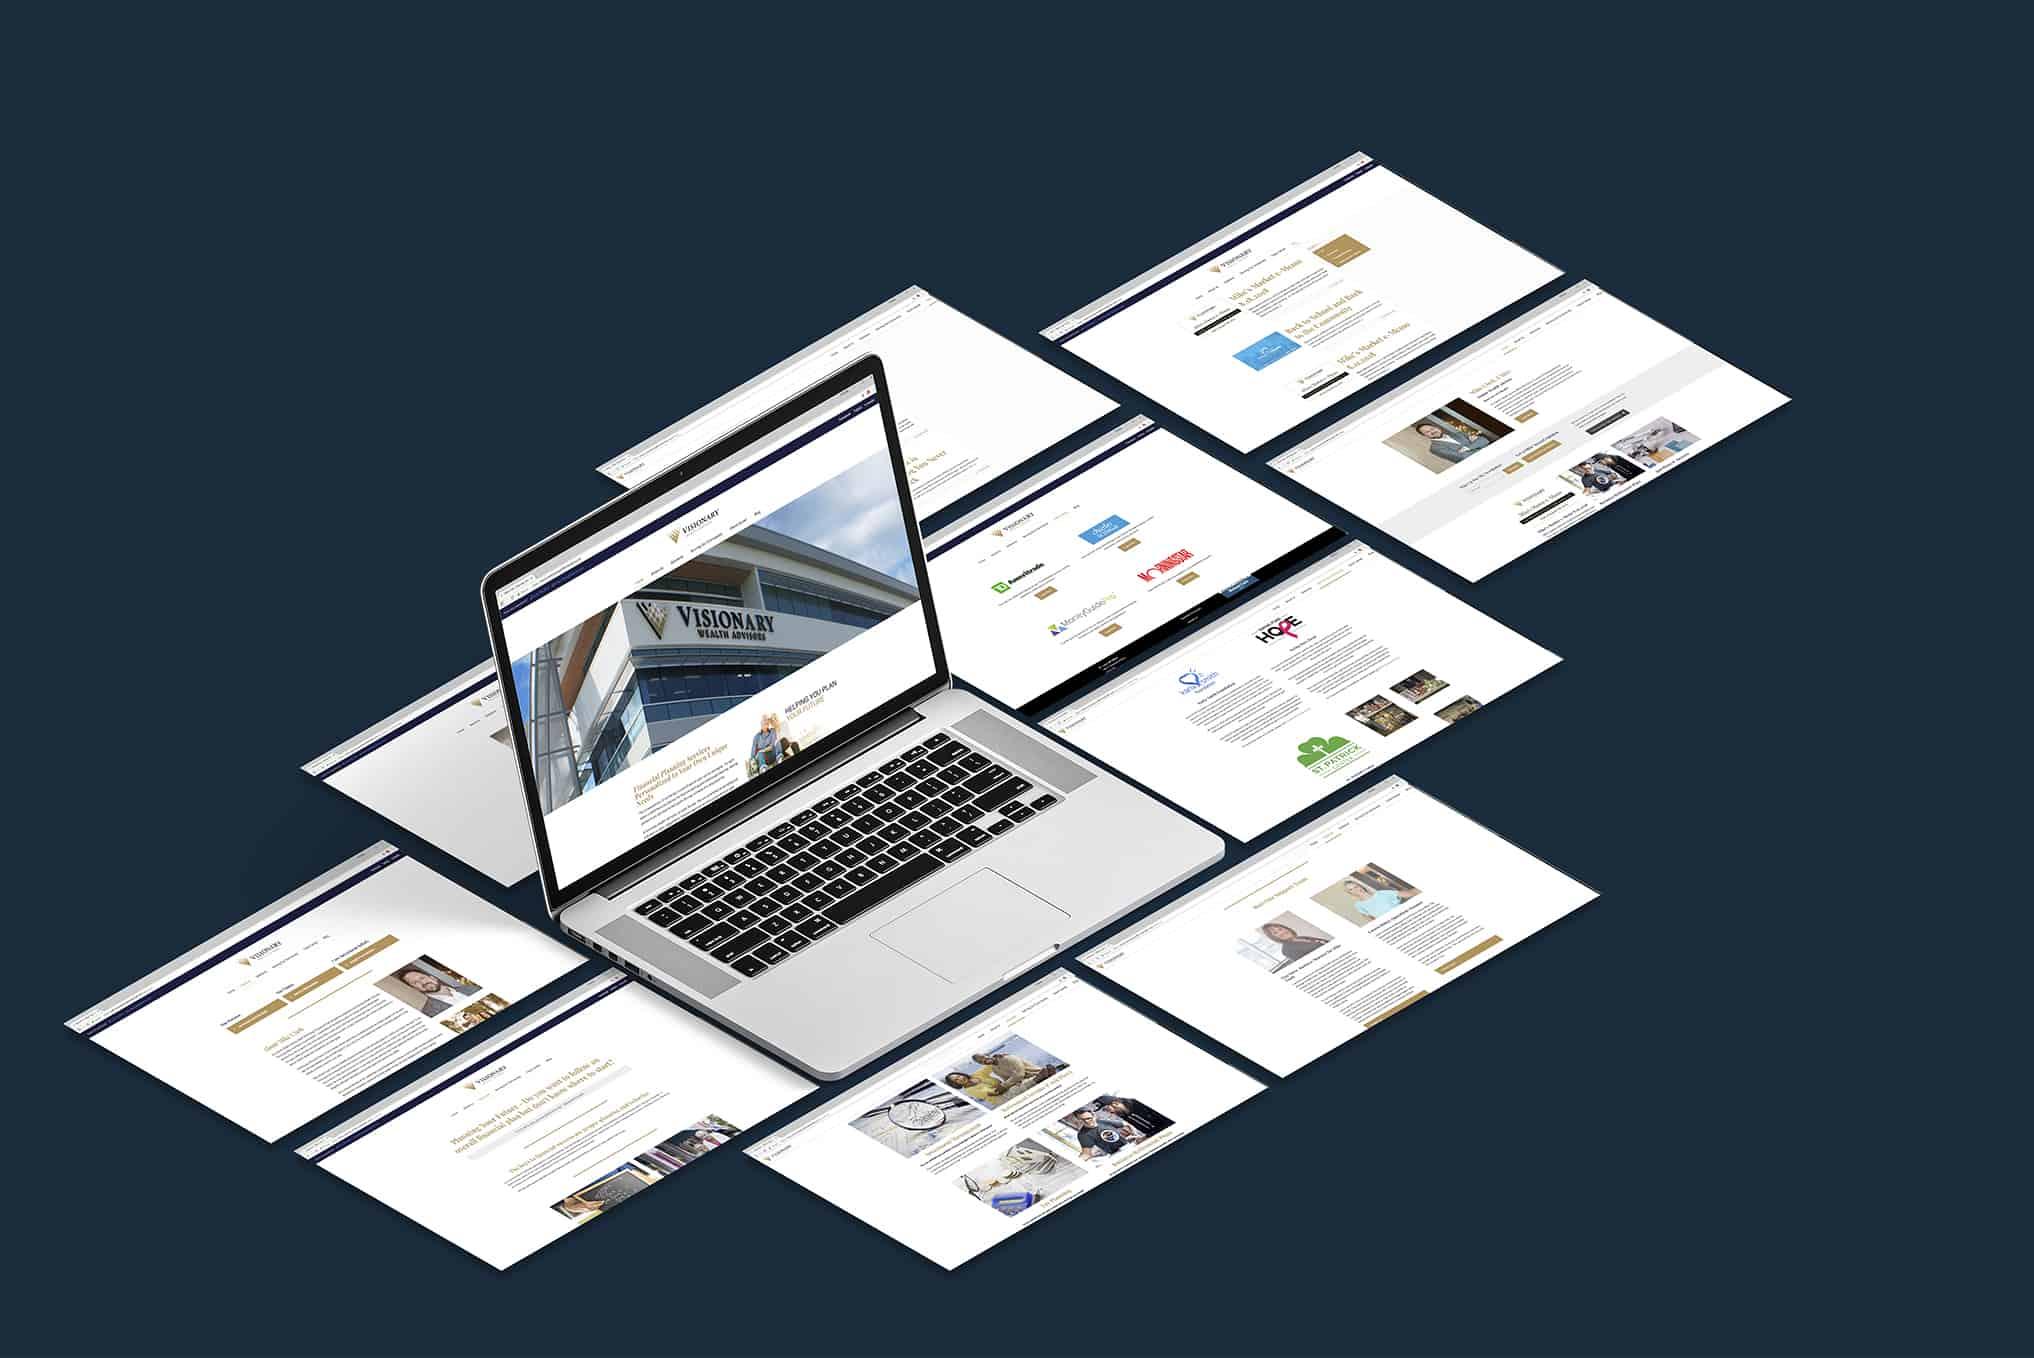 Visionary Wealth Mike Clark website mockup